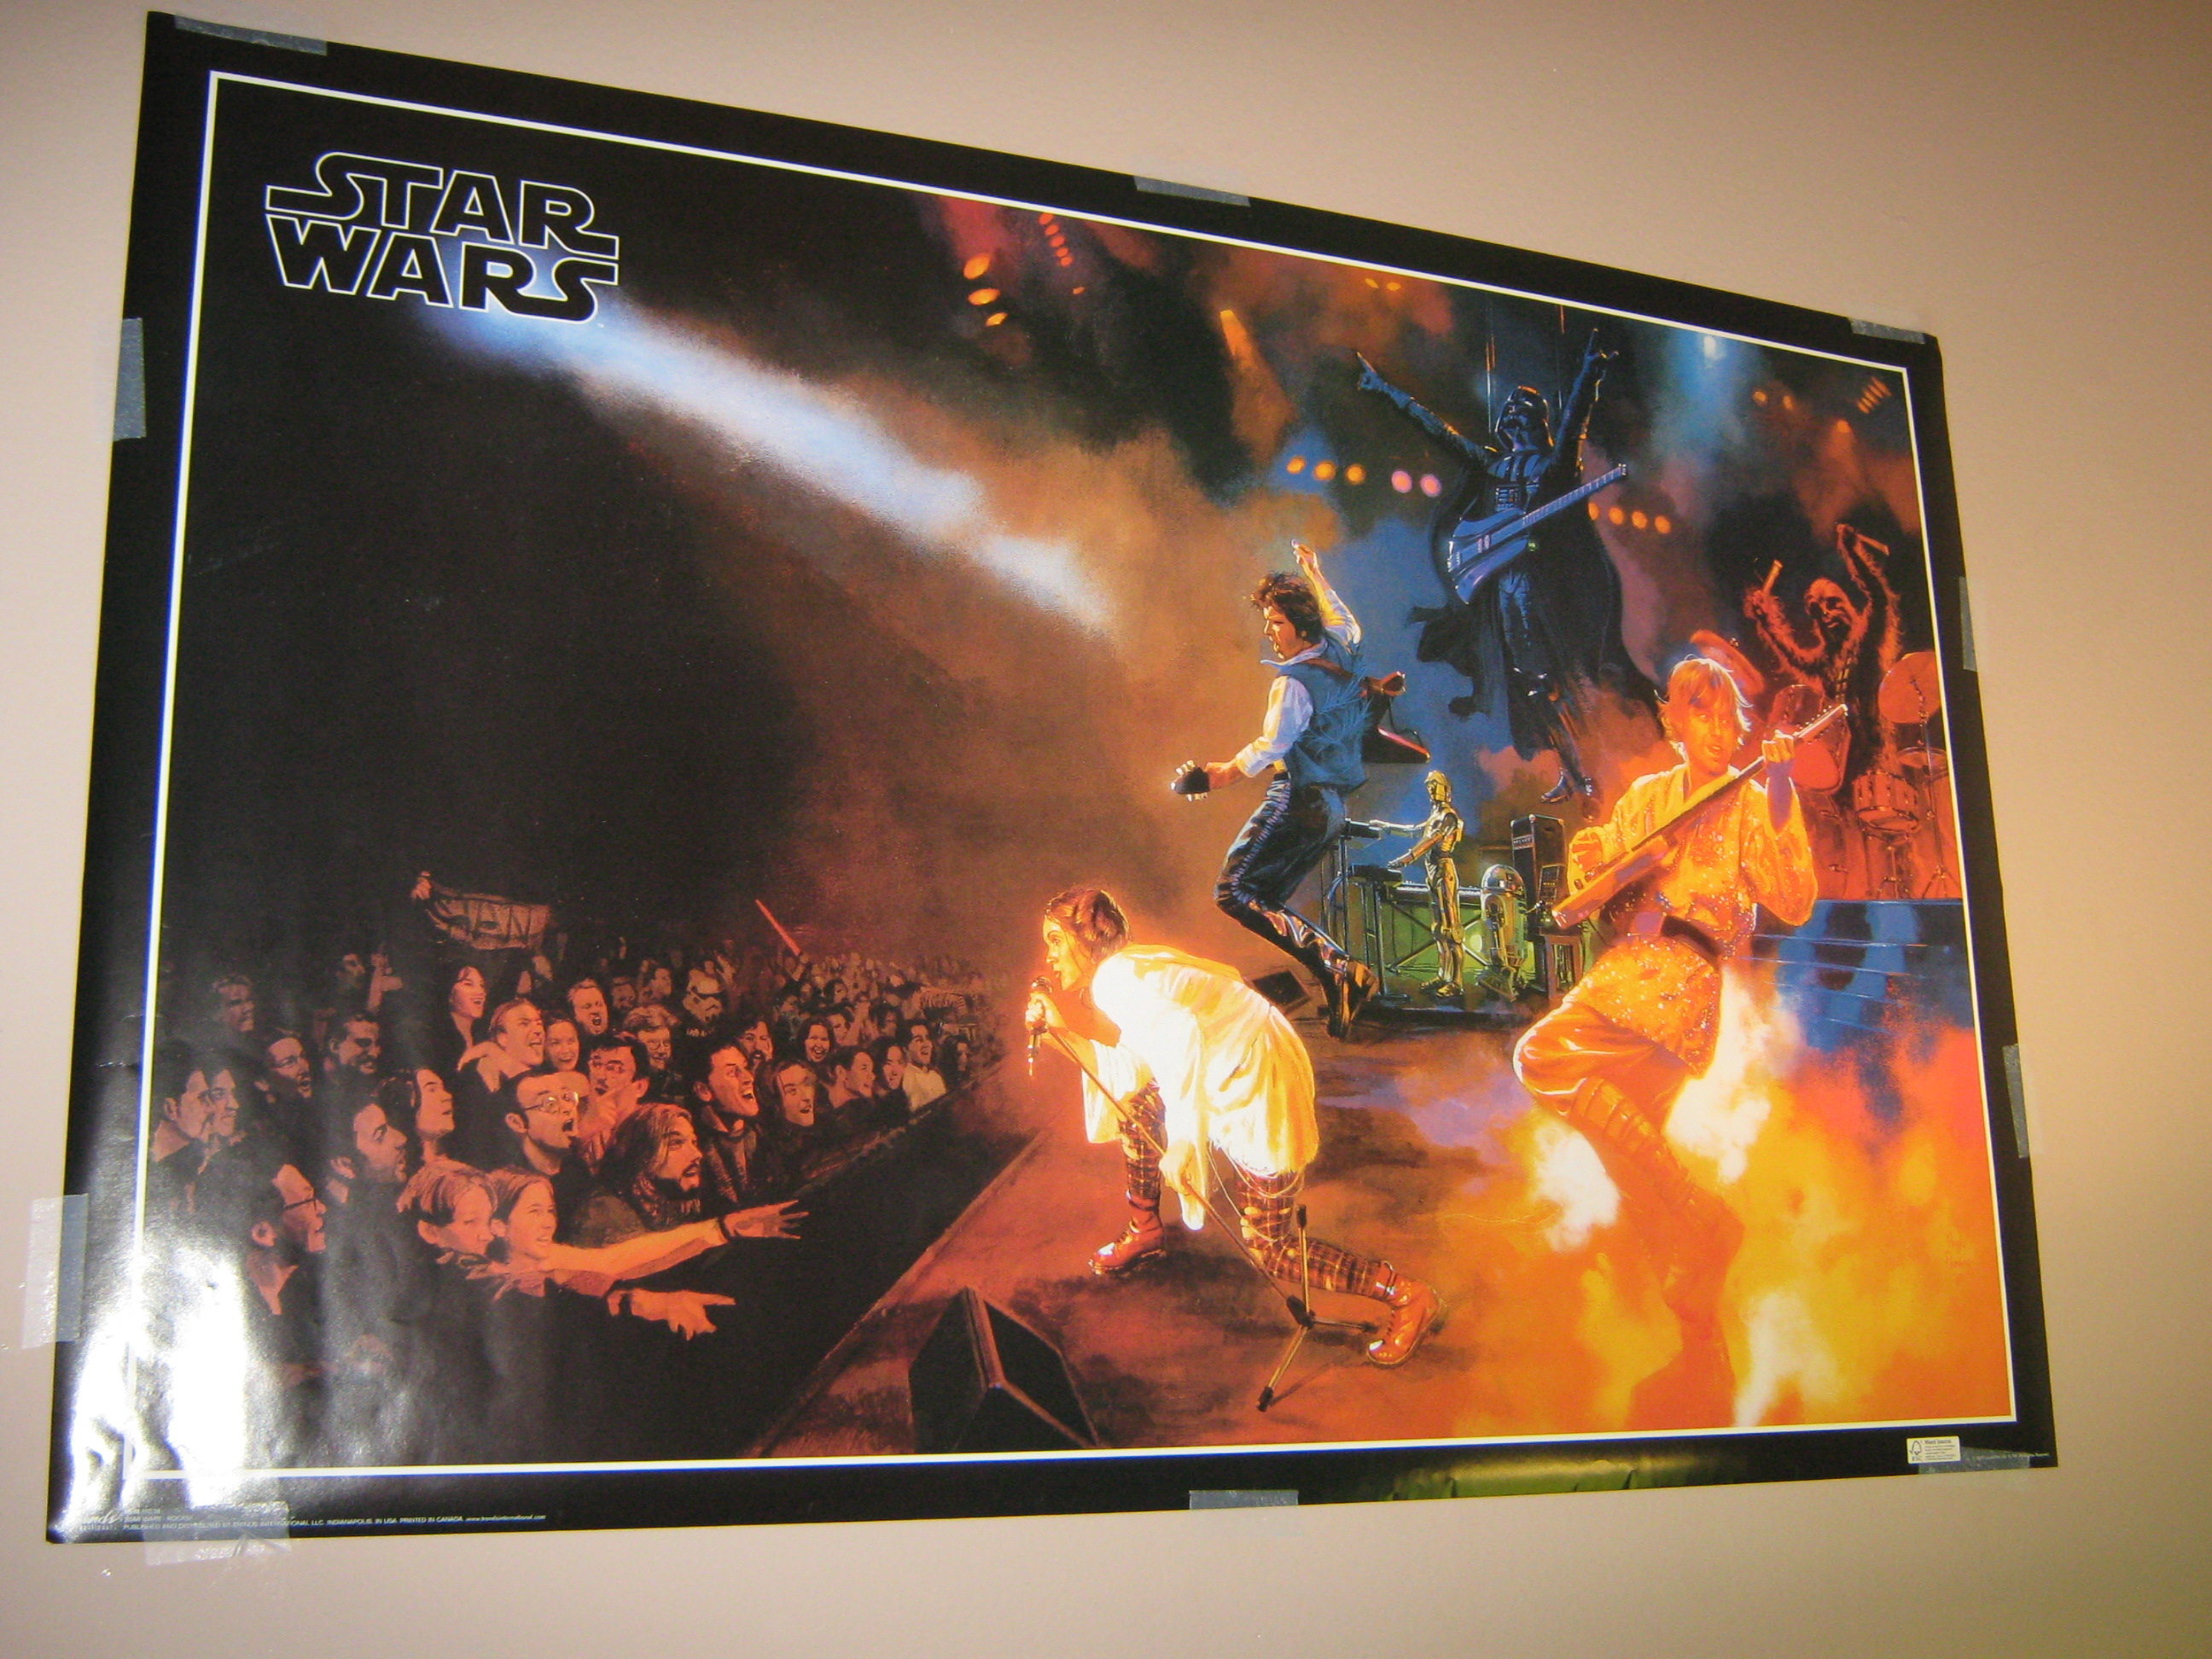 star wars rocks - full by limegreensquid on deviantart